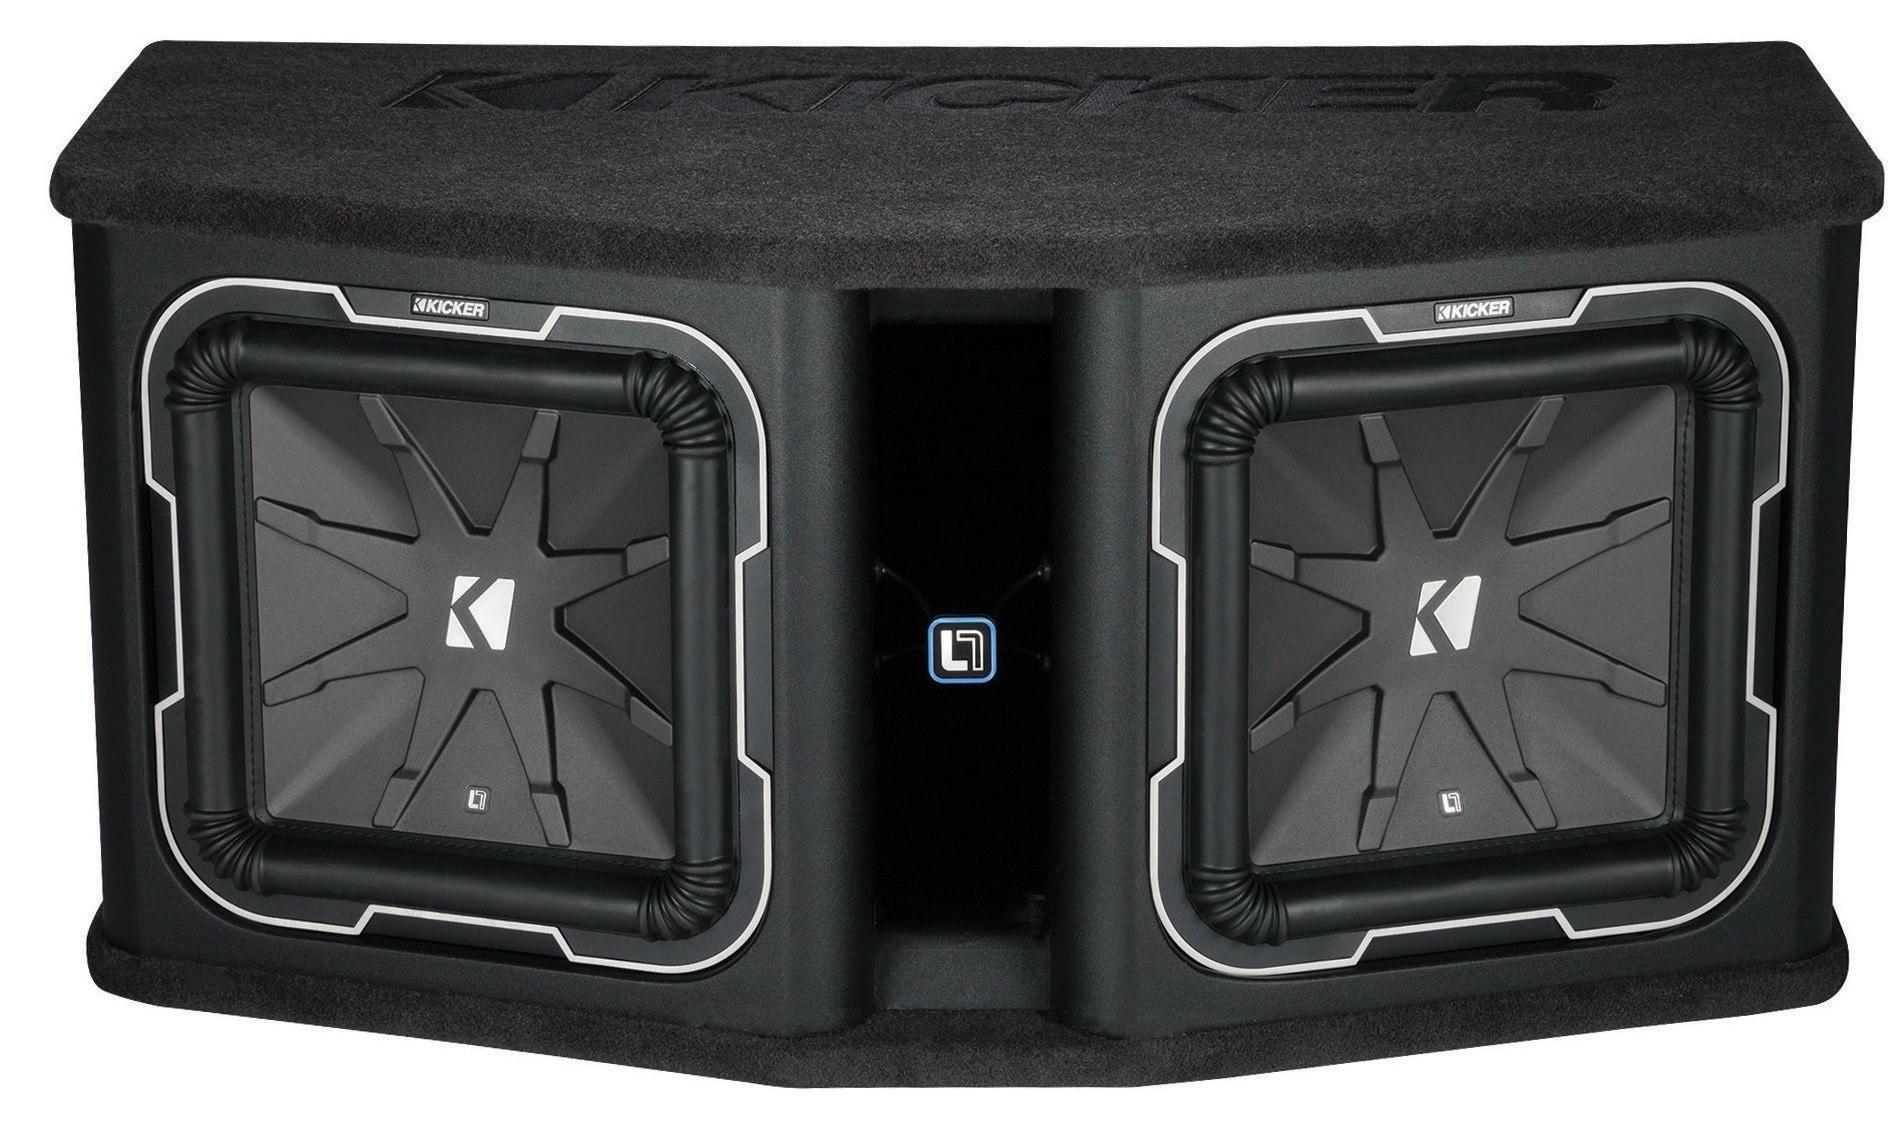 kicker subwoofer bassbox q class dl7122 2ohm 3600w. Black Bedroom Furniture Sets. Home Design Ideas